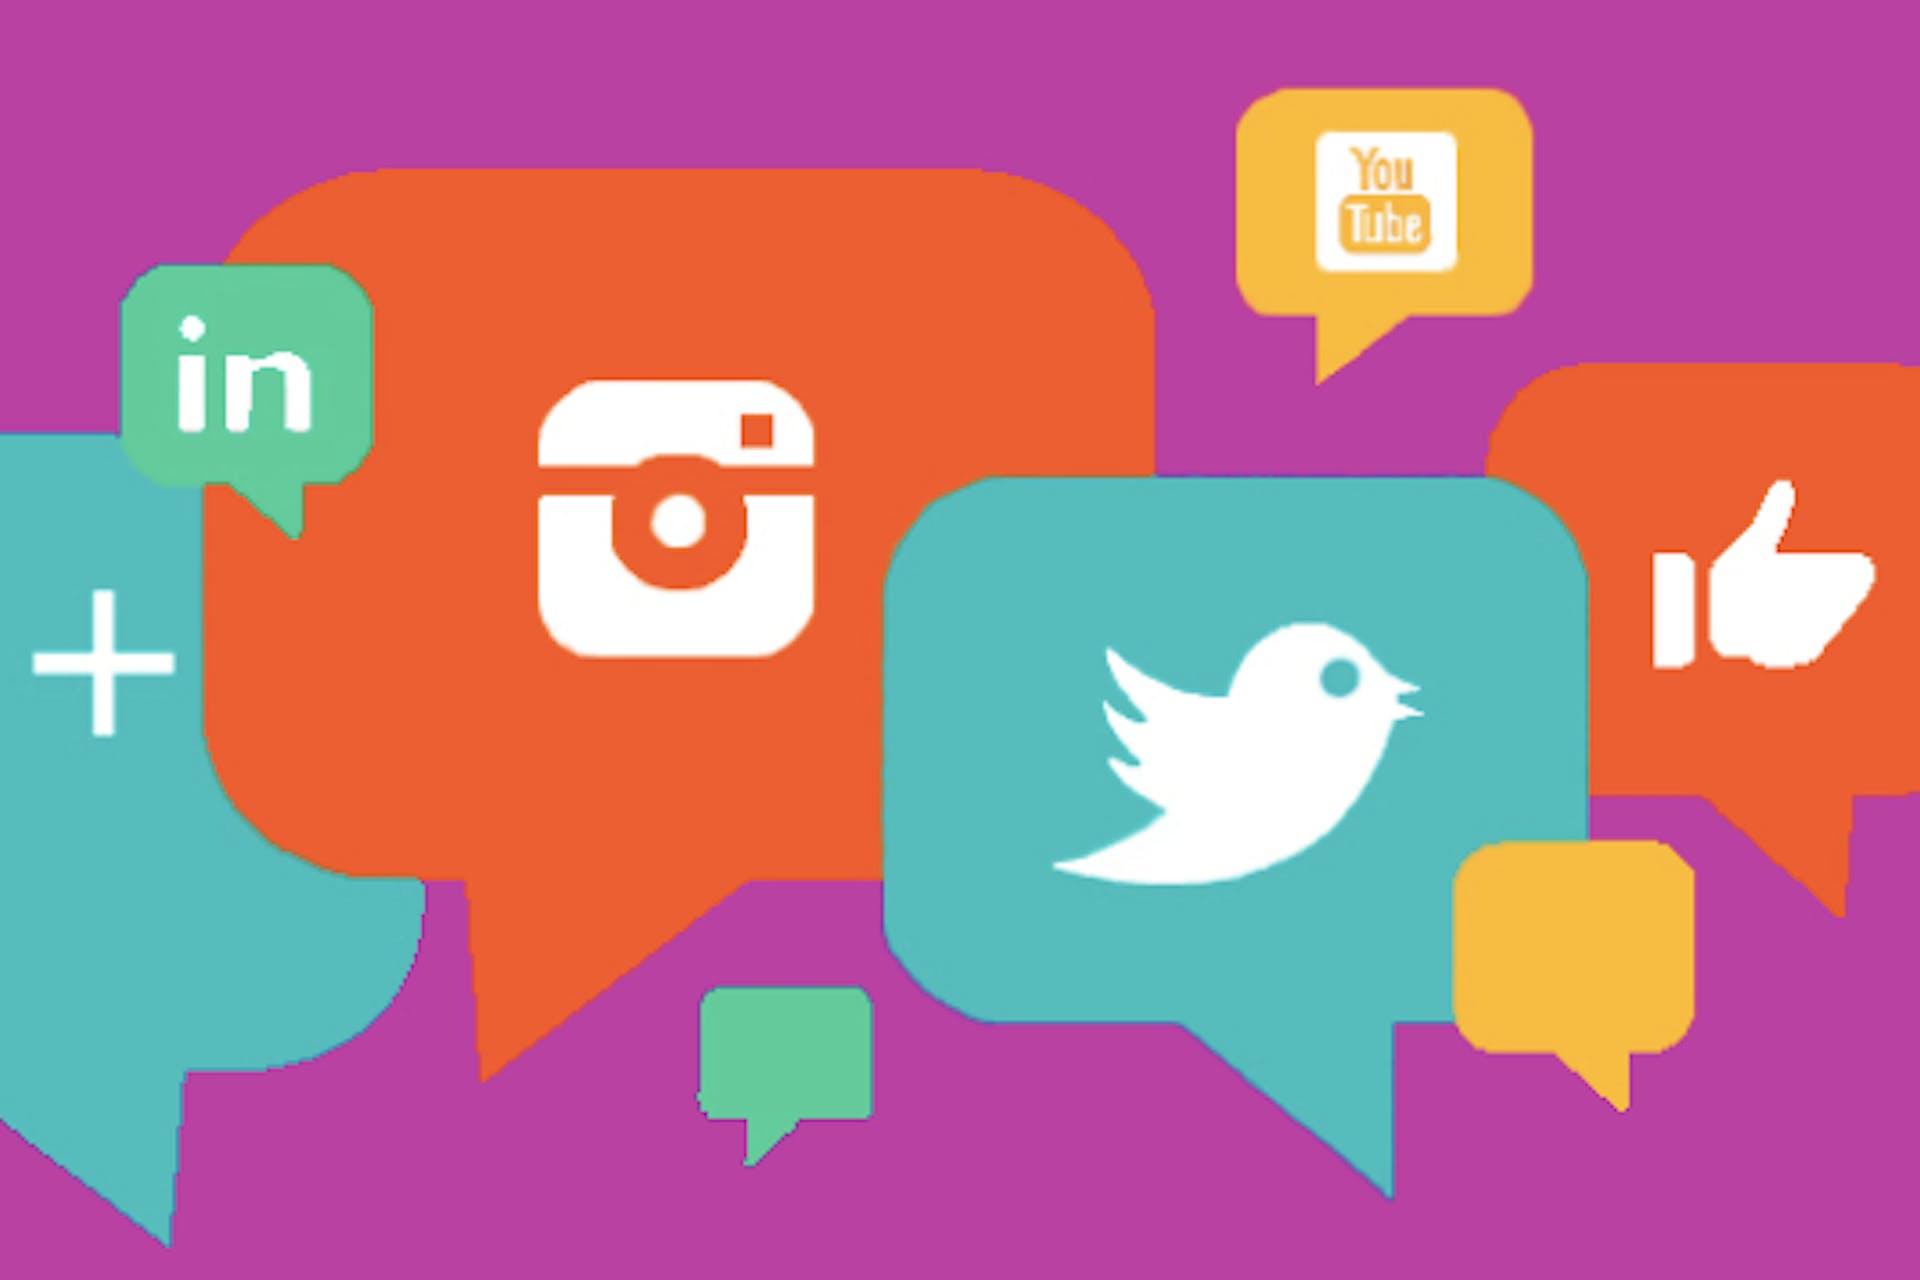 Social media icons in speech bubbles.